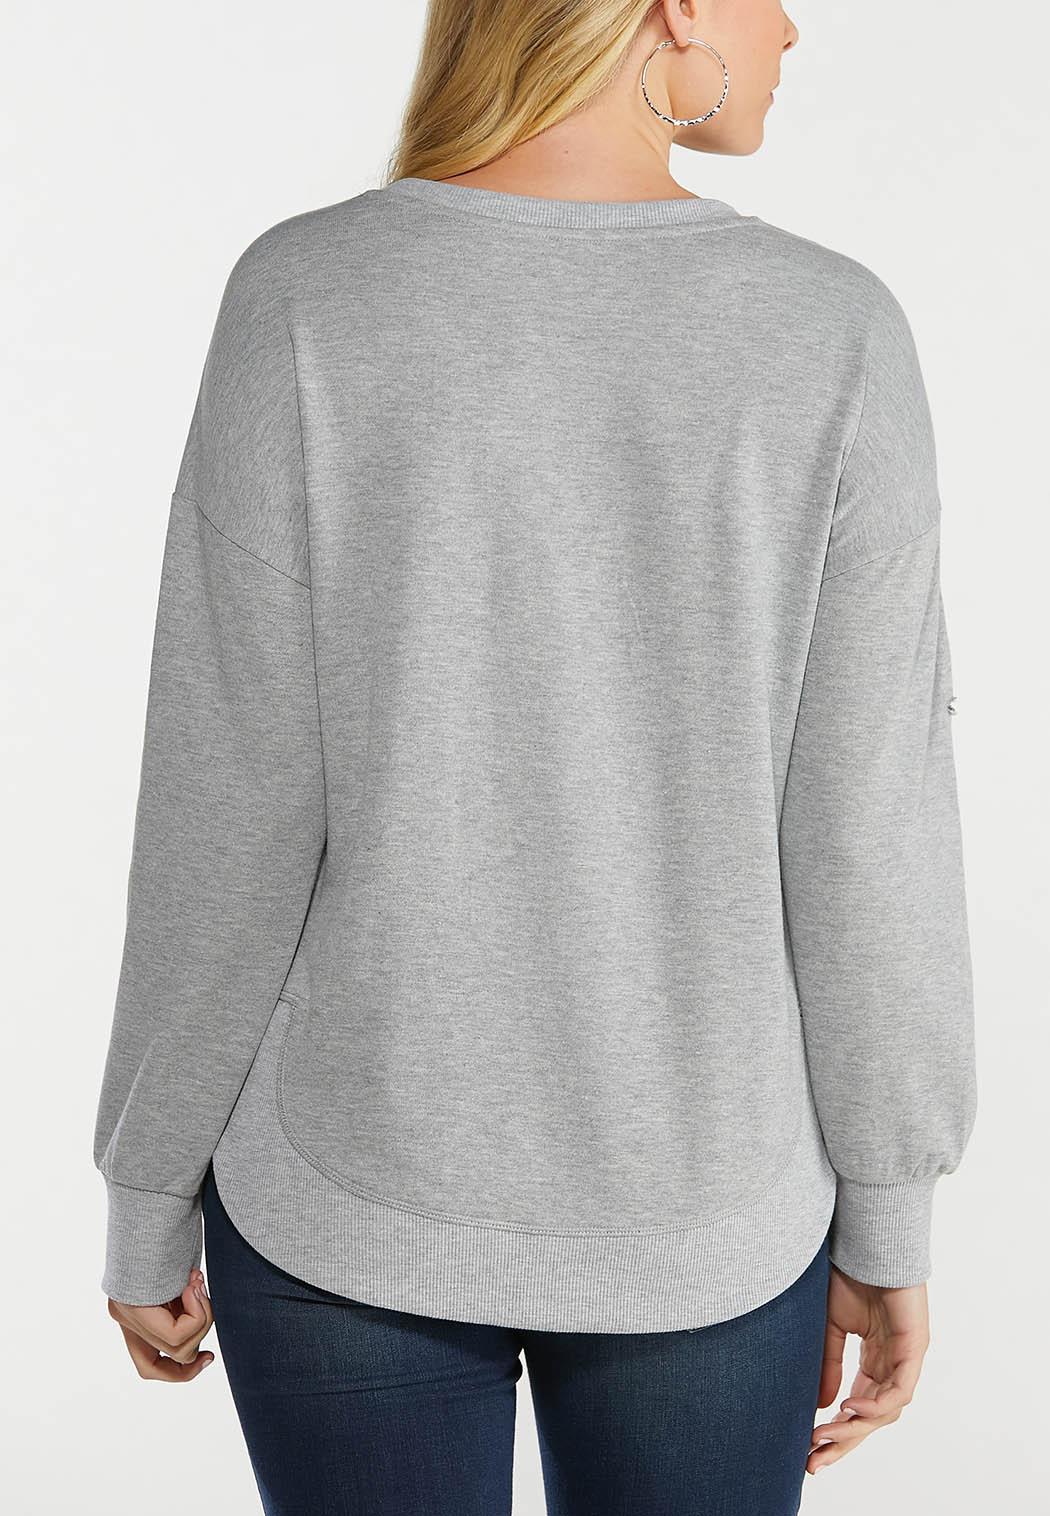 Gray Distressed Sweatshirt (Item #44562998)